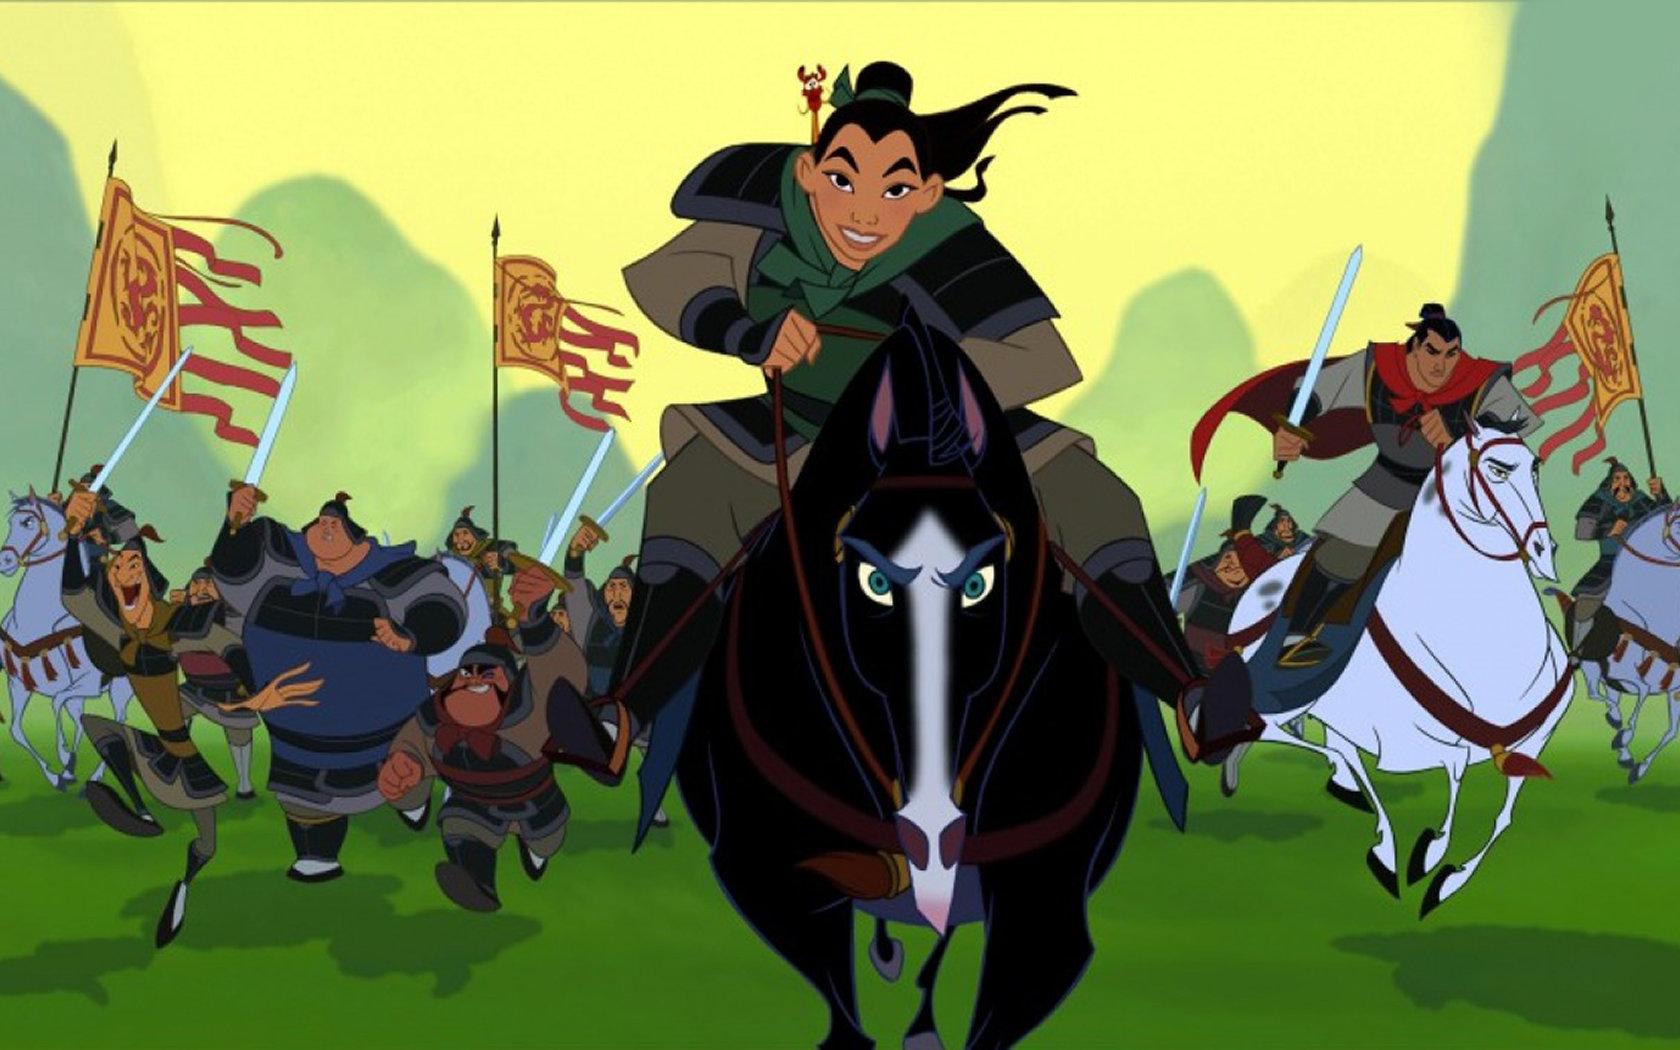 Mulan Wallpapers Hd For Desktop Backgrounds